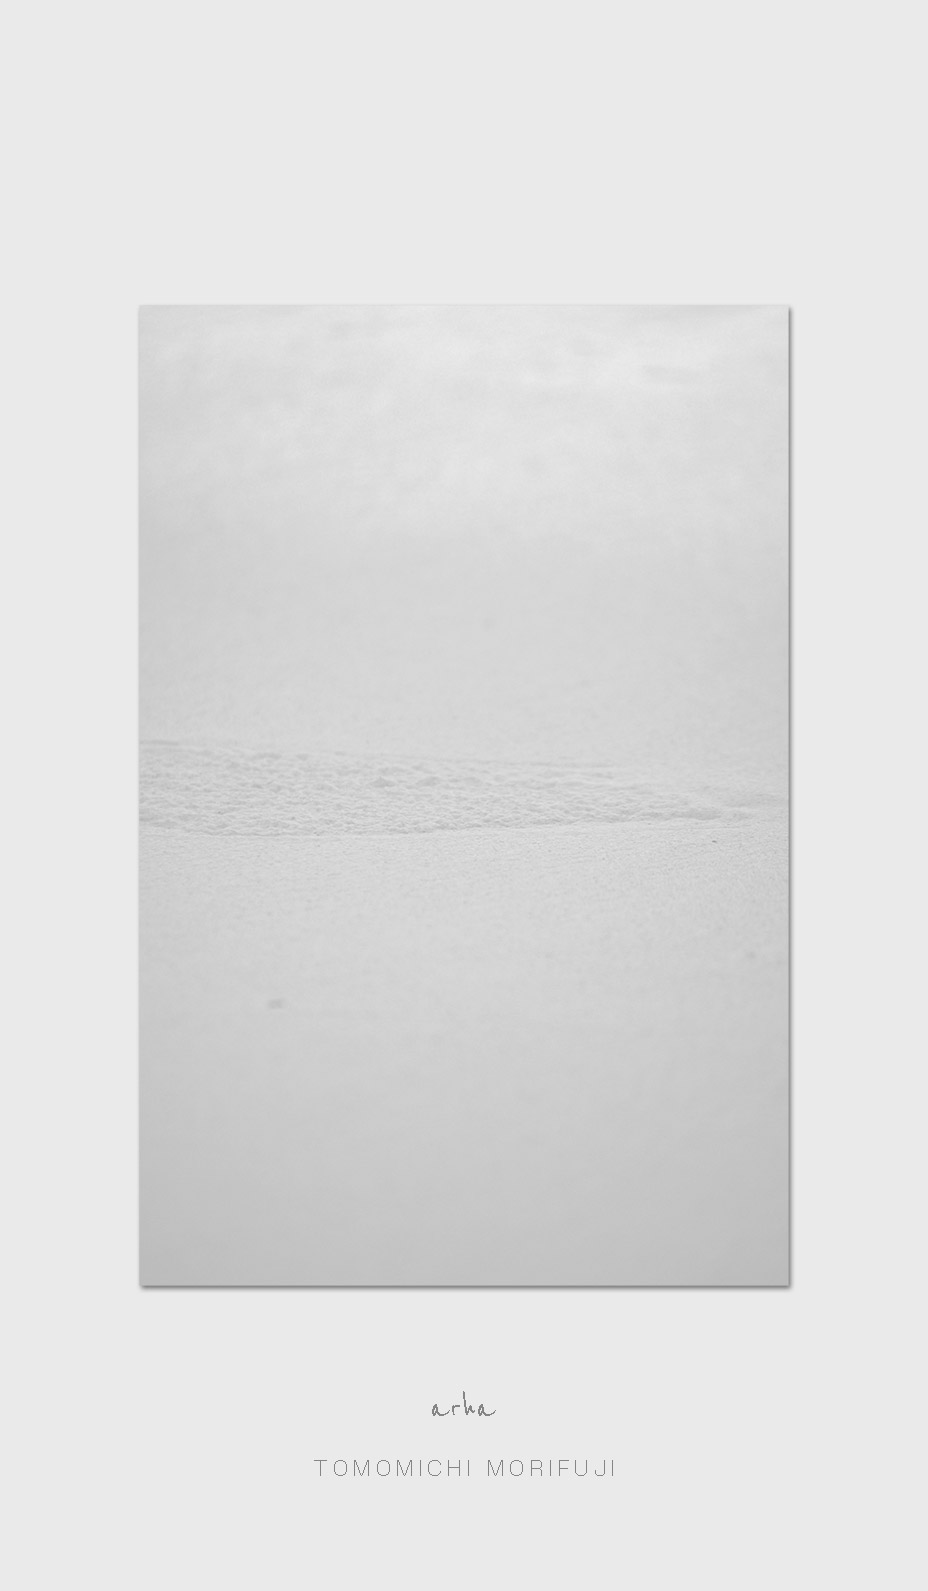 Remainder-of-the-wave-copyright-2012-arha-Tomomichi-Morifuji